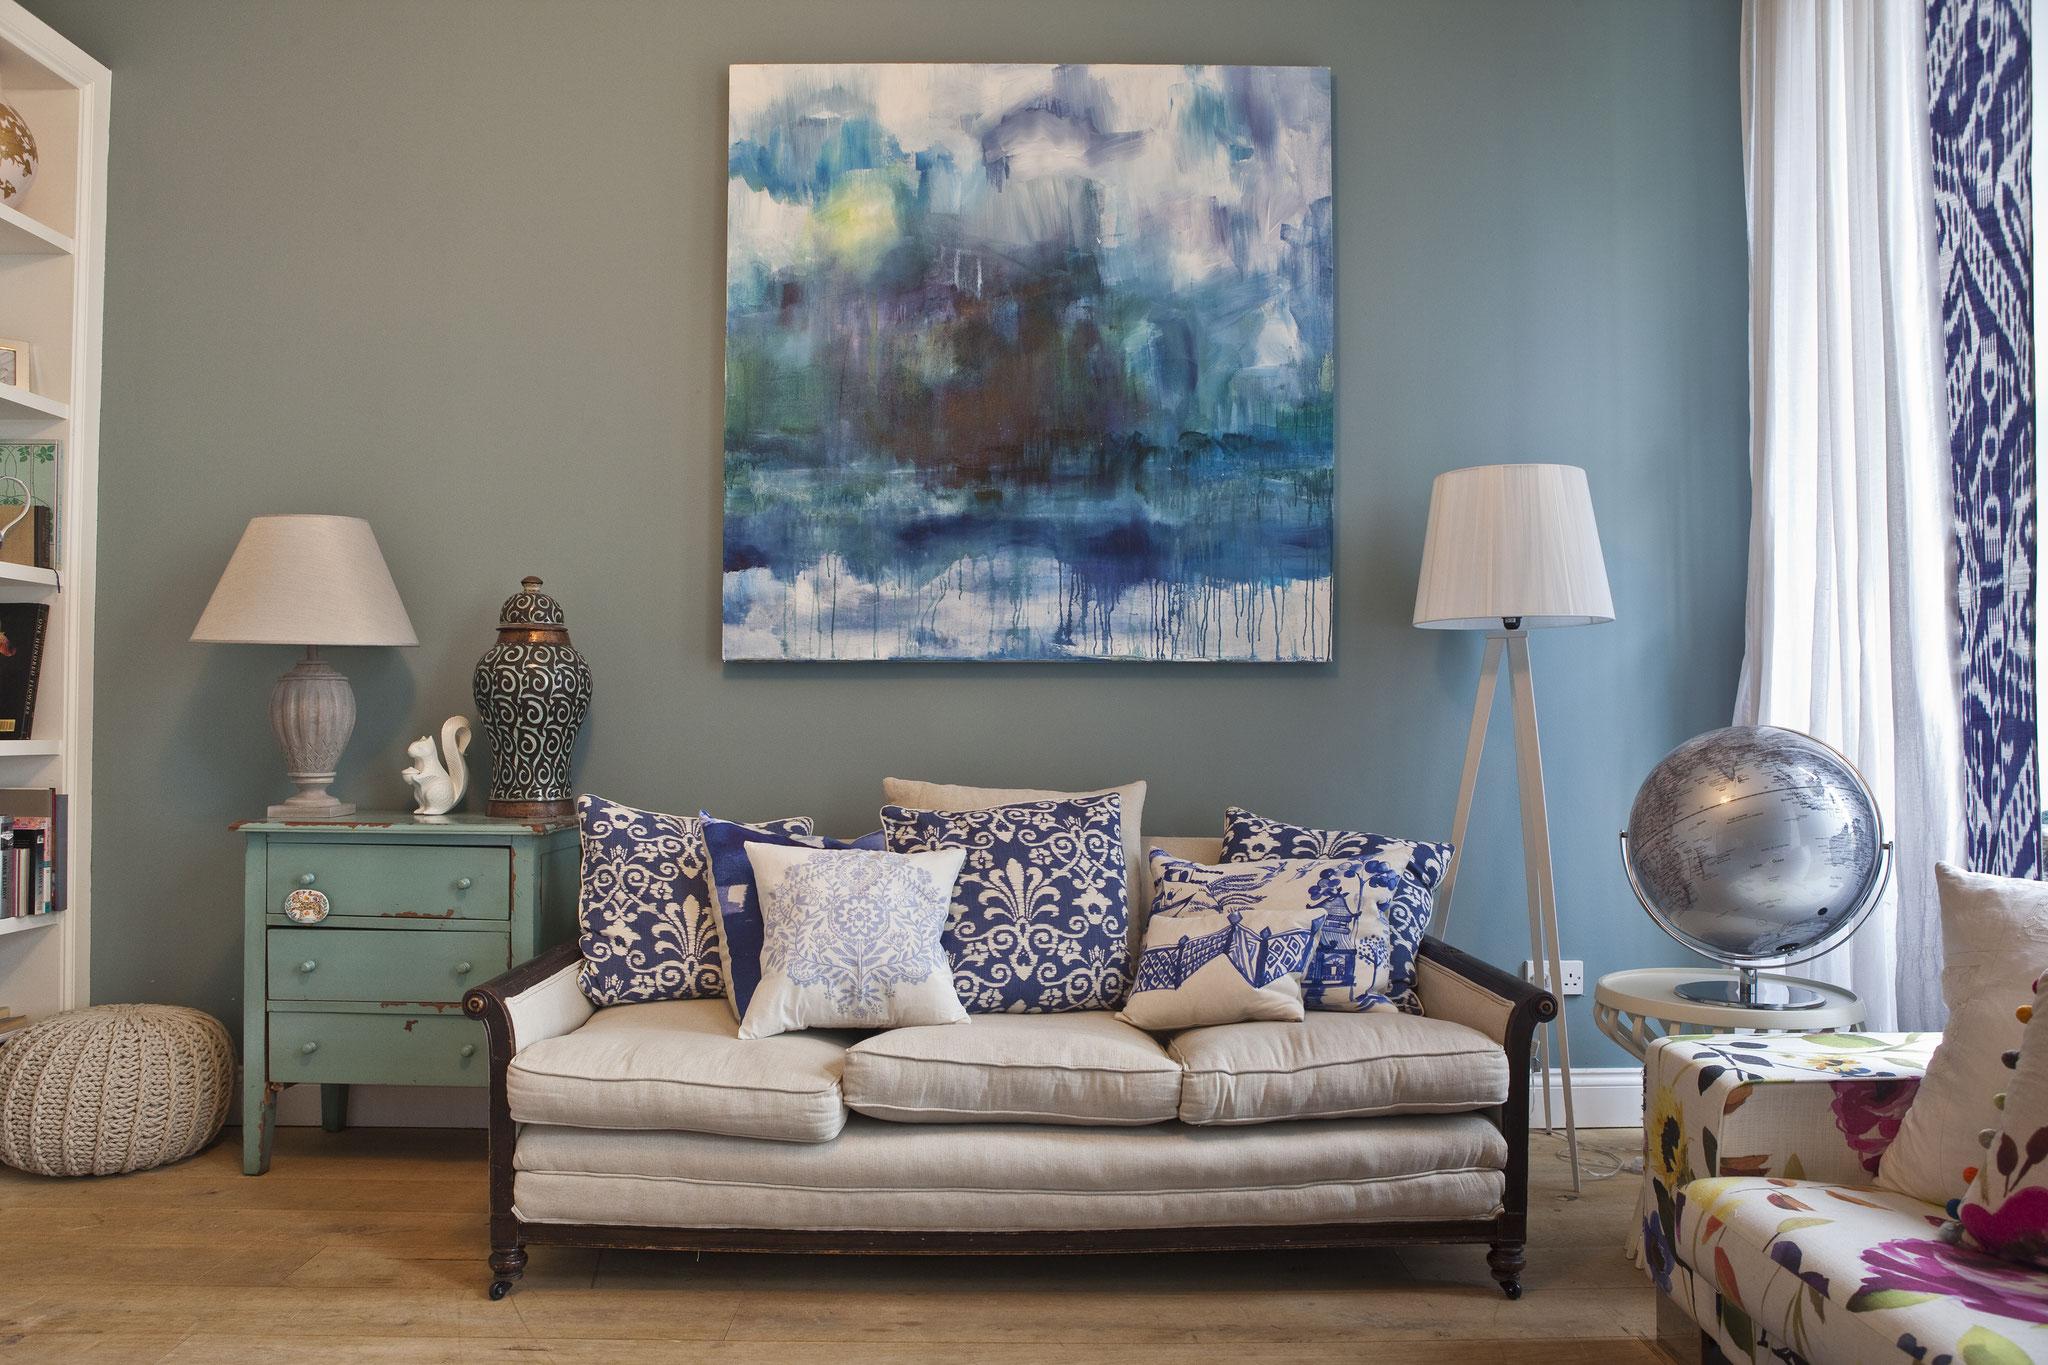 farrow ball hamburg cb farbenkontor hamburg. Black Bedroom Furniture Sets. Home Design Ideas